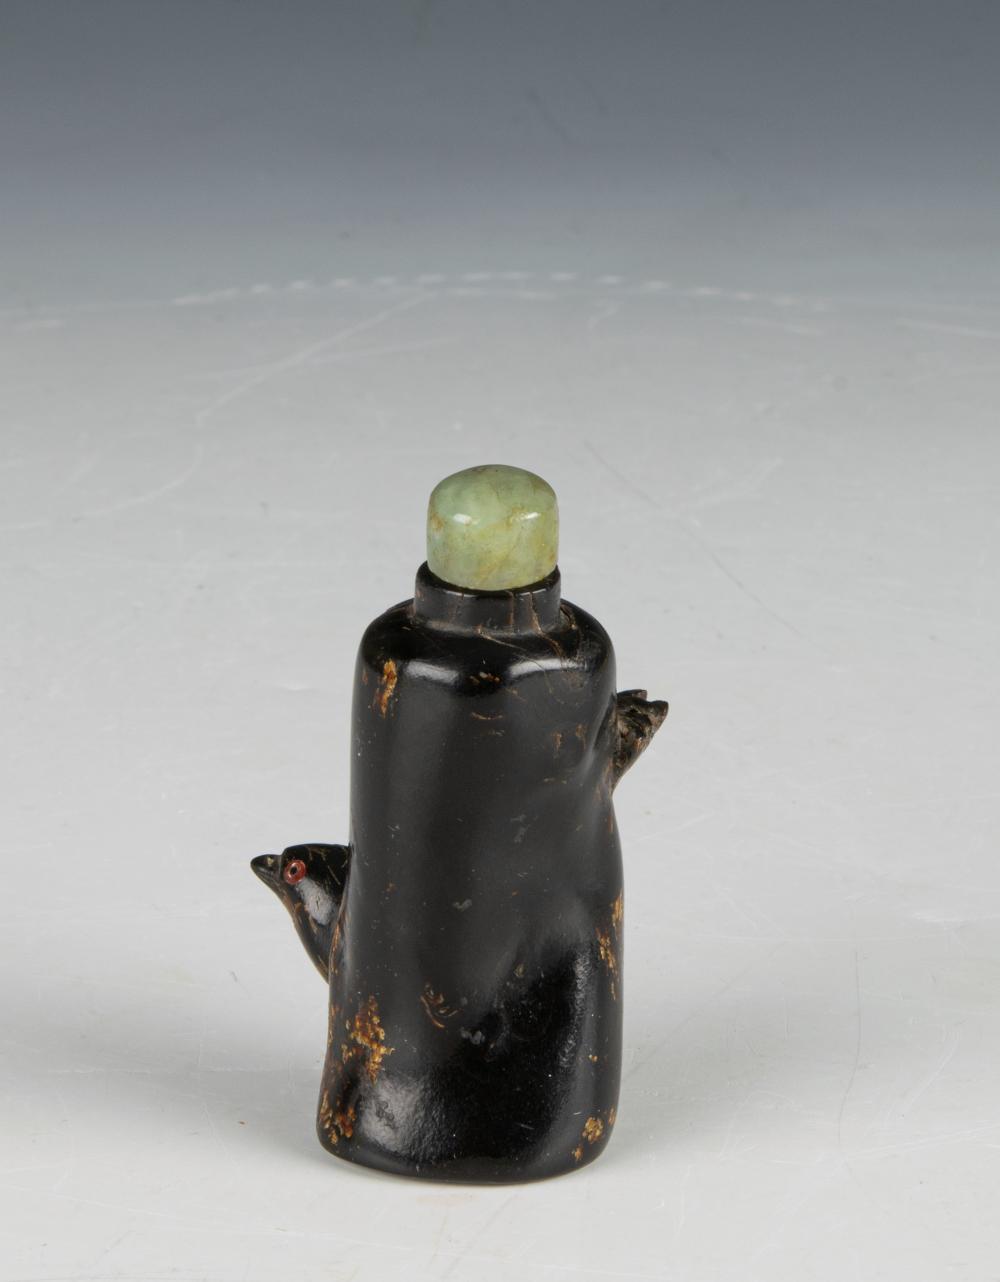 Lot 633: CHINESE MI LA/BLACK AMBER SNUFF BOTTLE, 19TH CENTURY